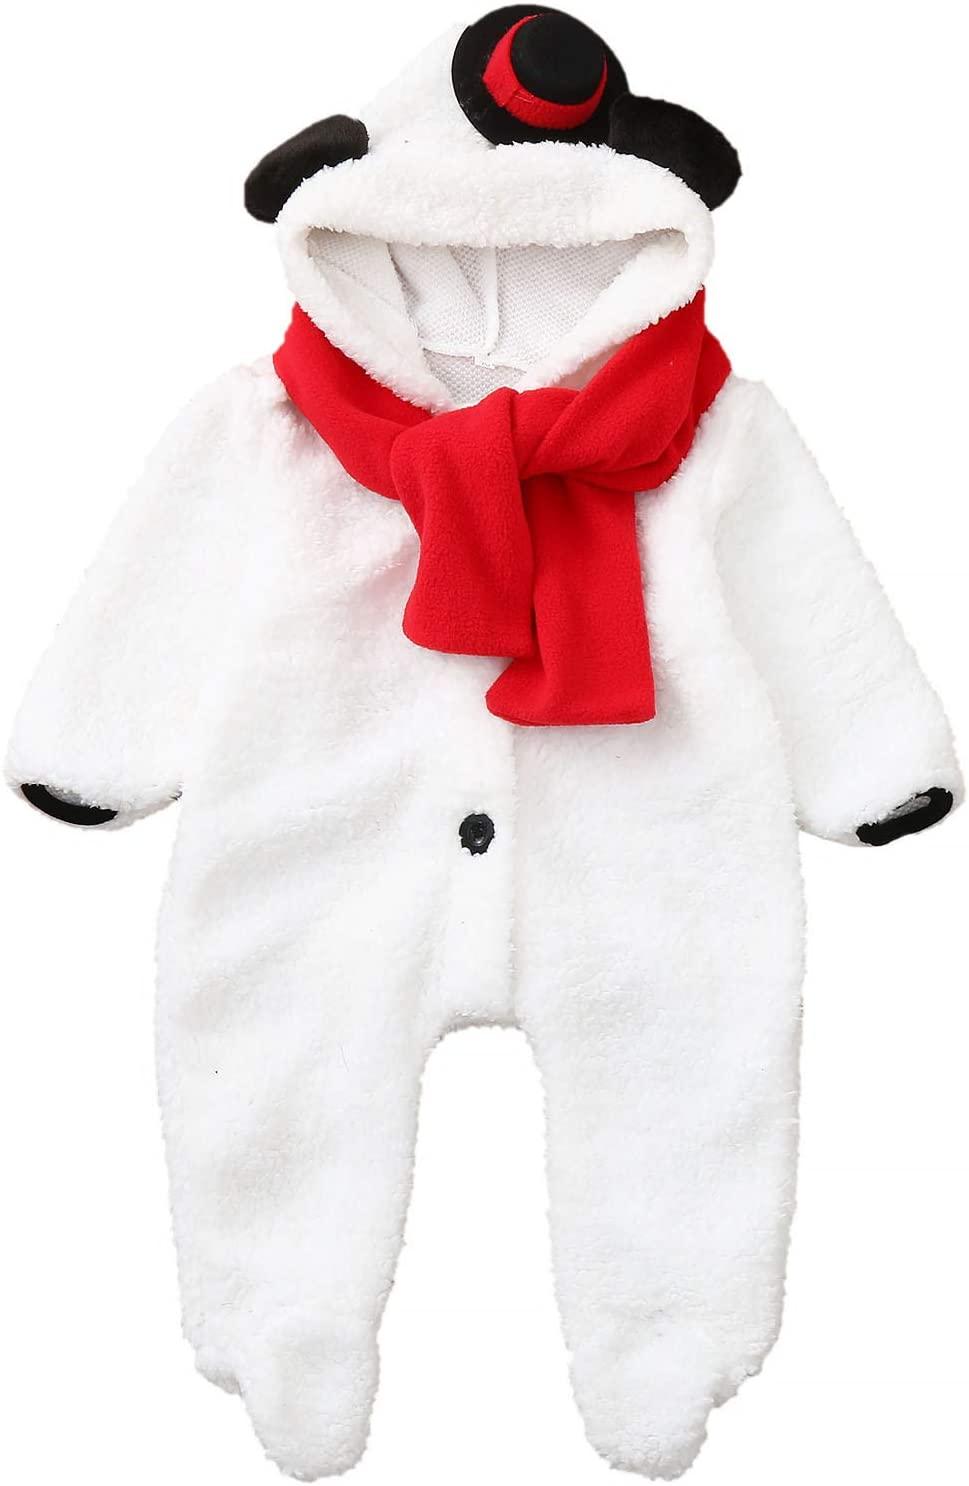 Shirt Luv Newborn Baby Boys Girl Christmas Snowman Fleece Jumpsuit Romper Warm Outwear Boys Romper&Jumpsuit Winter Fall Clothes 2020 Plus Size